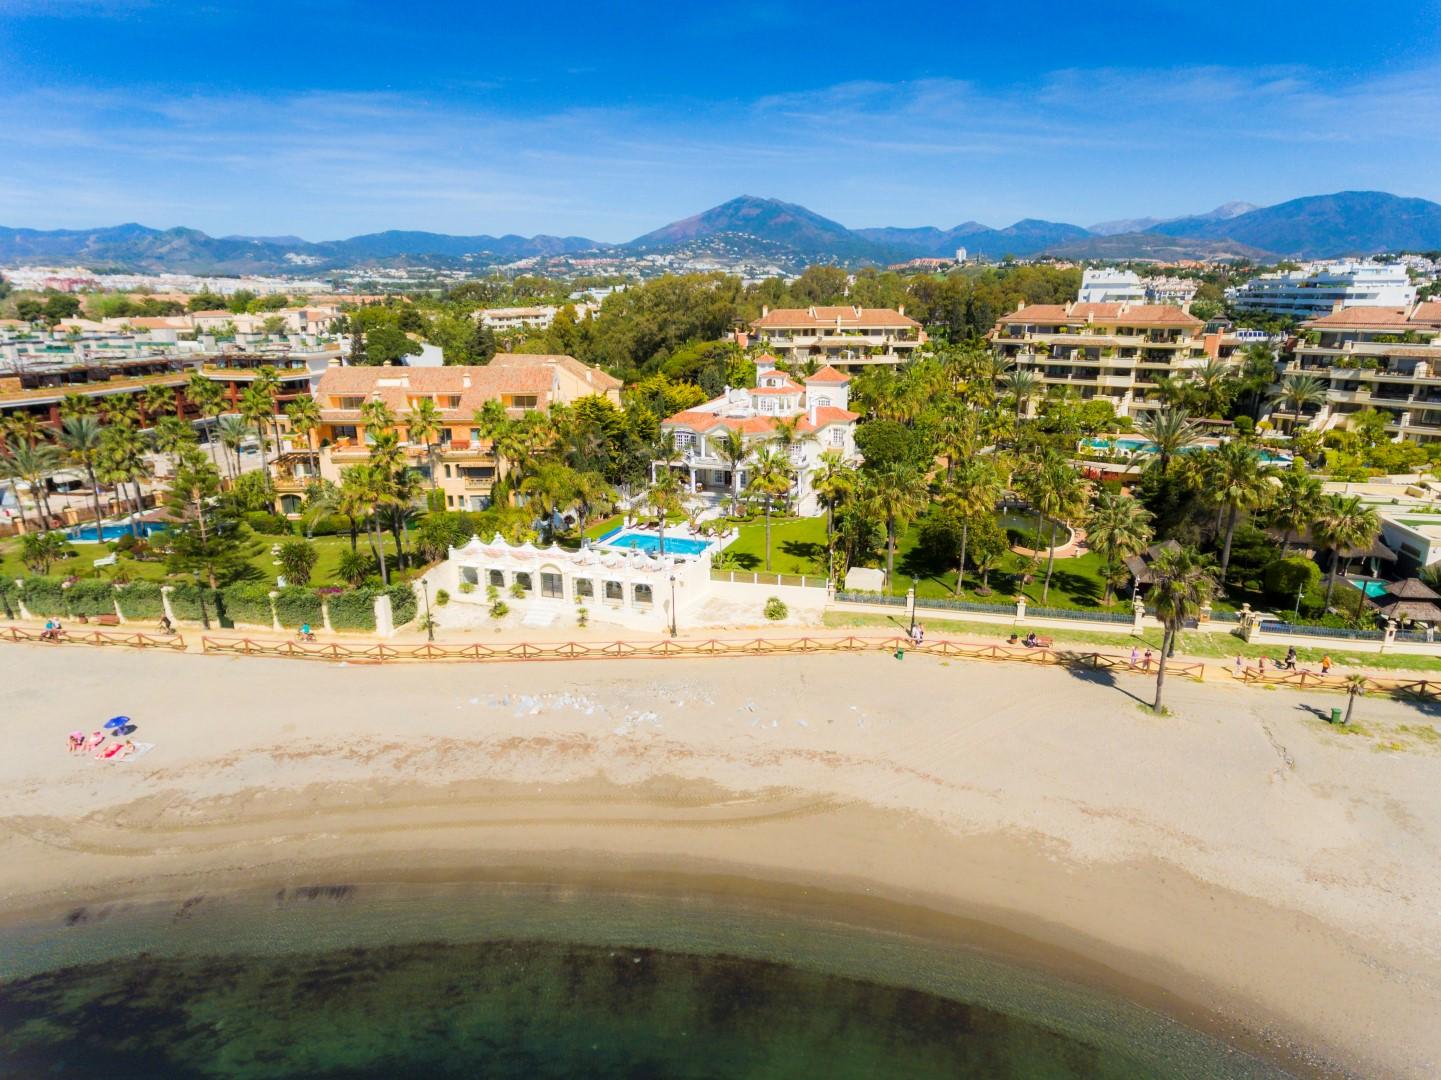 Private Luxury Auction: El Martinete, frontline beach villa in Puerto Banus. No reserve price.